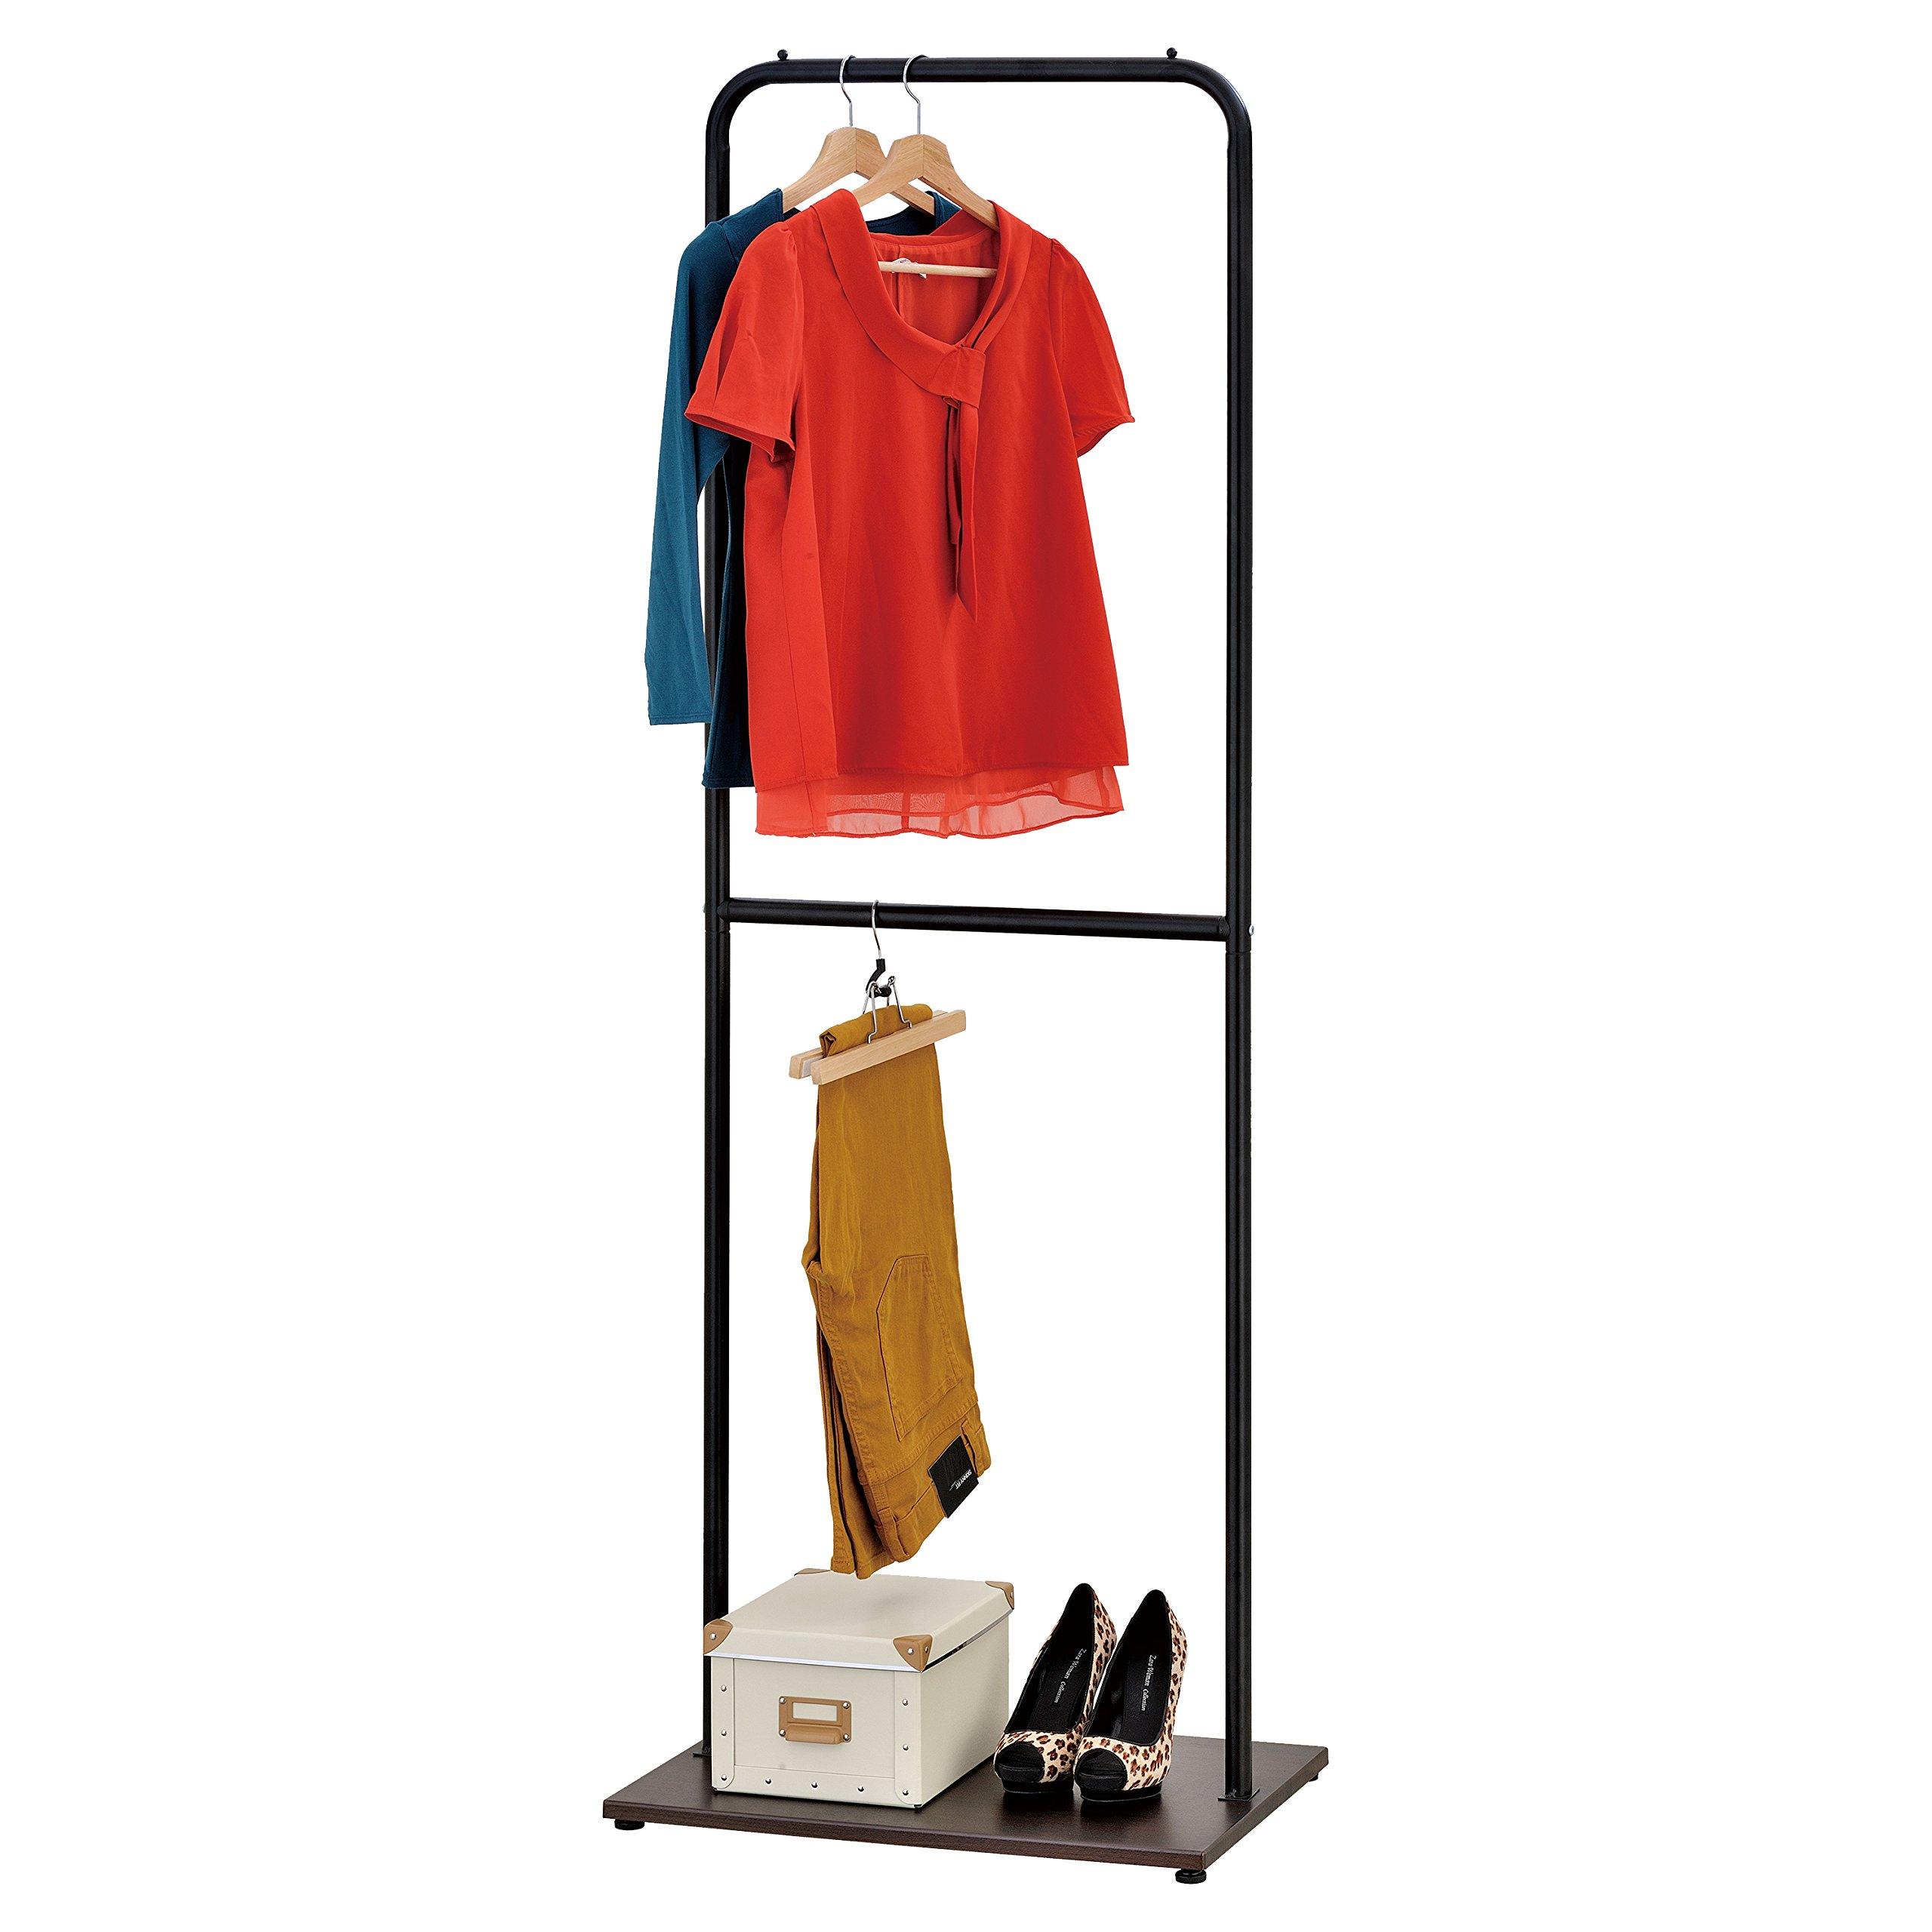 MyGift Single Bar Garment Rack, Metal Pipe Design Clothes Hanger with Wood Base